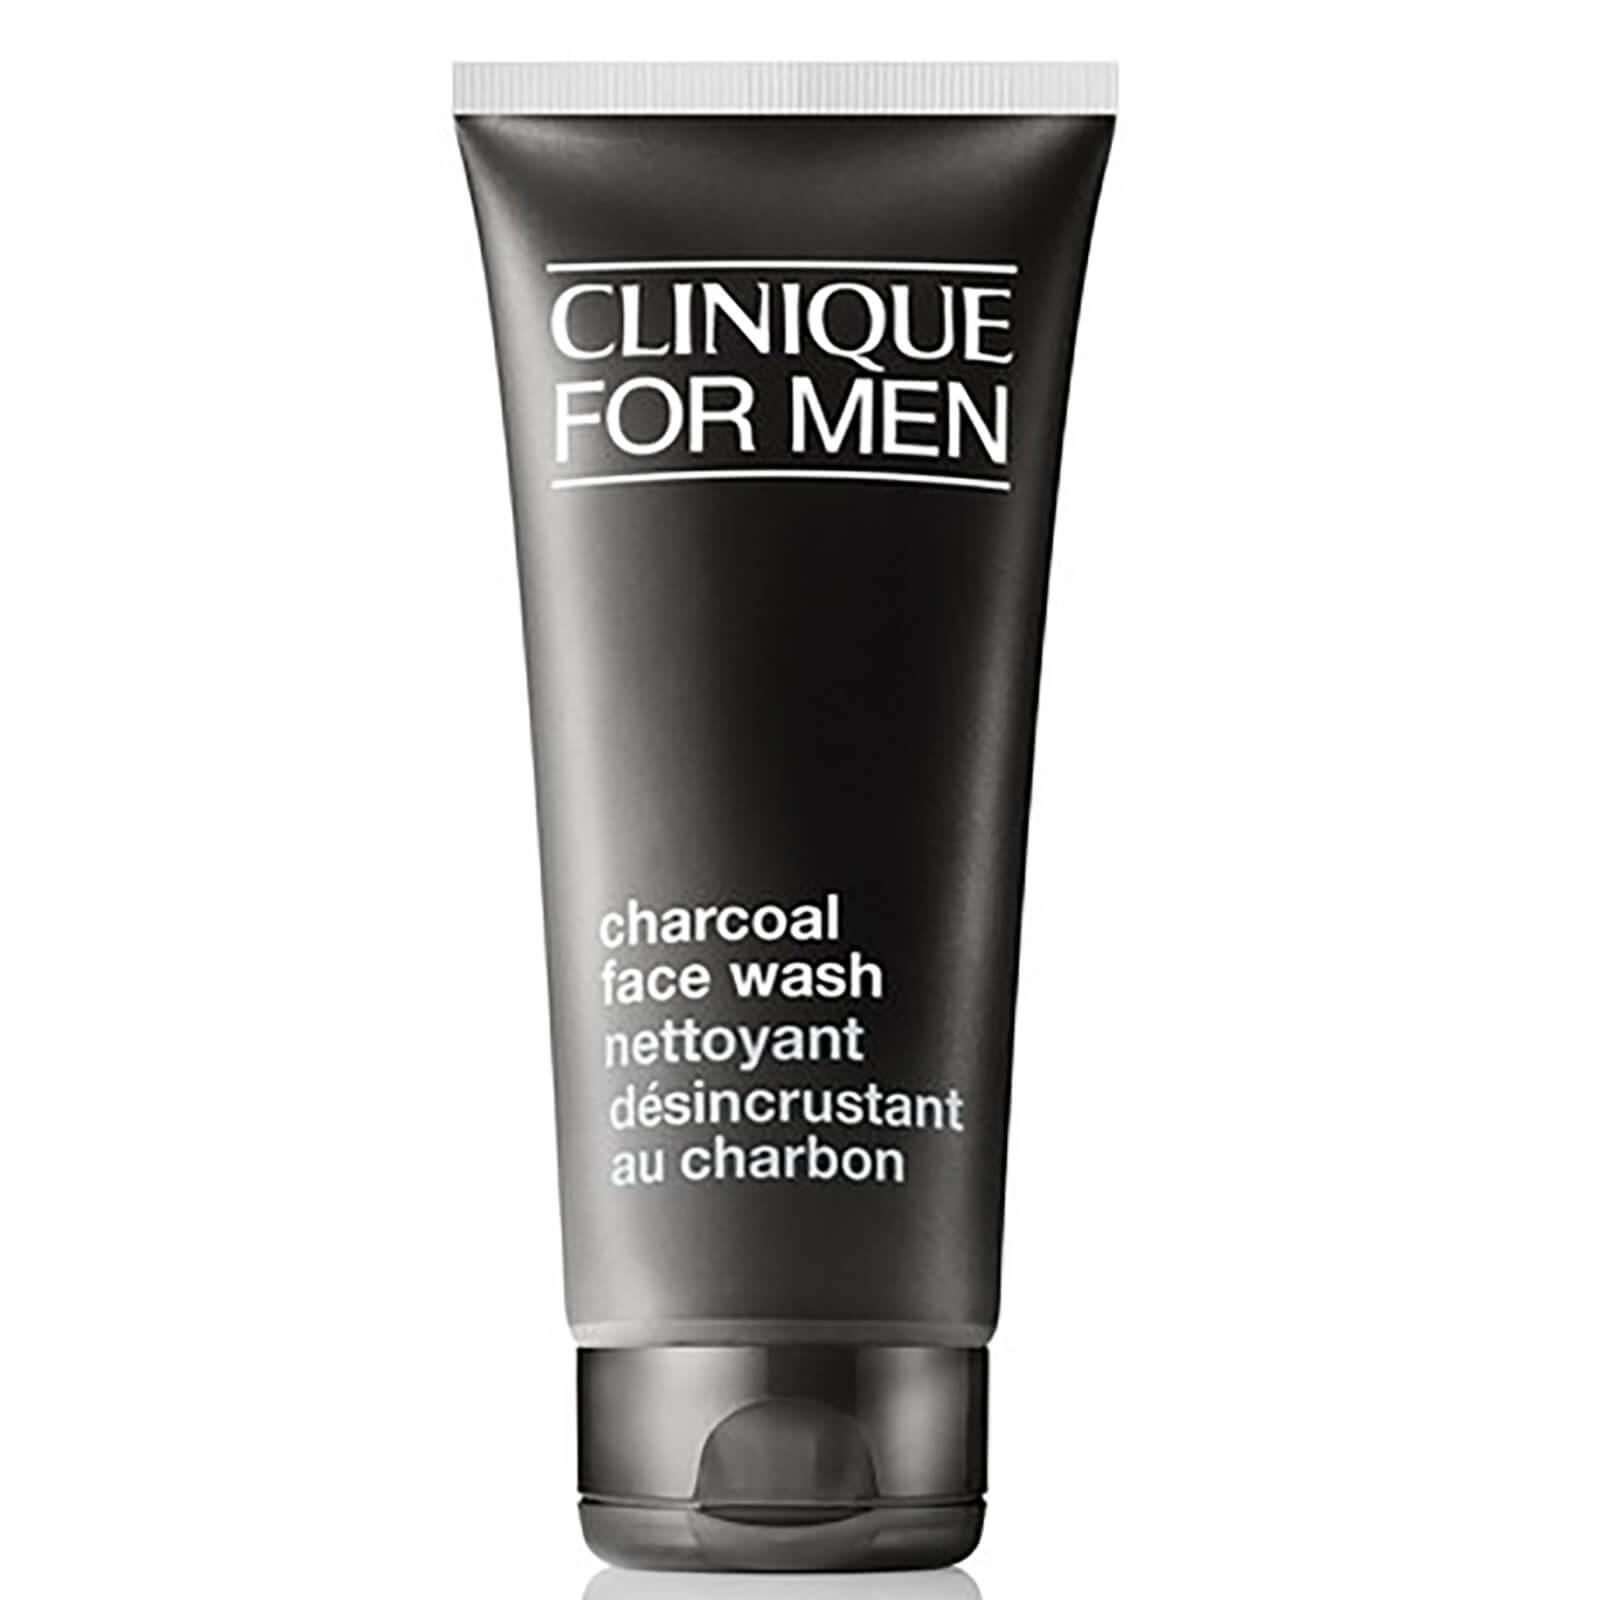 Clinique Limpiador facial de arcilla para hombres de Clinique (200 ml)